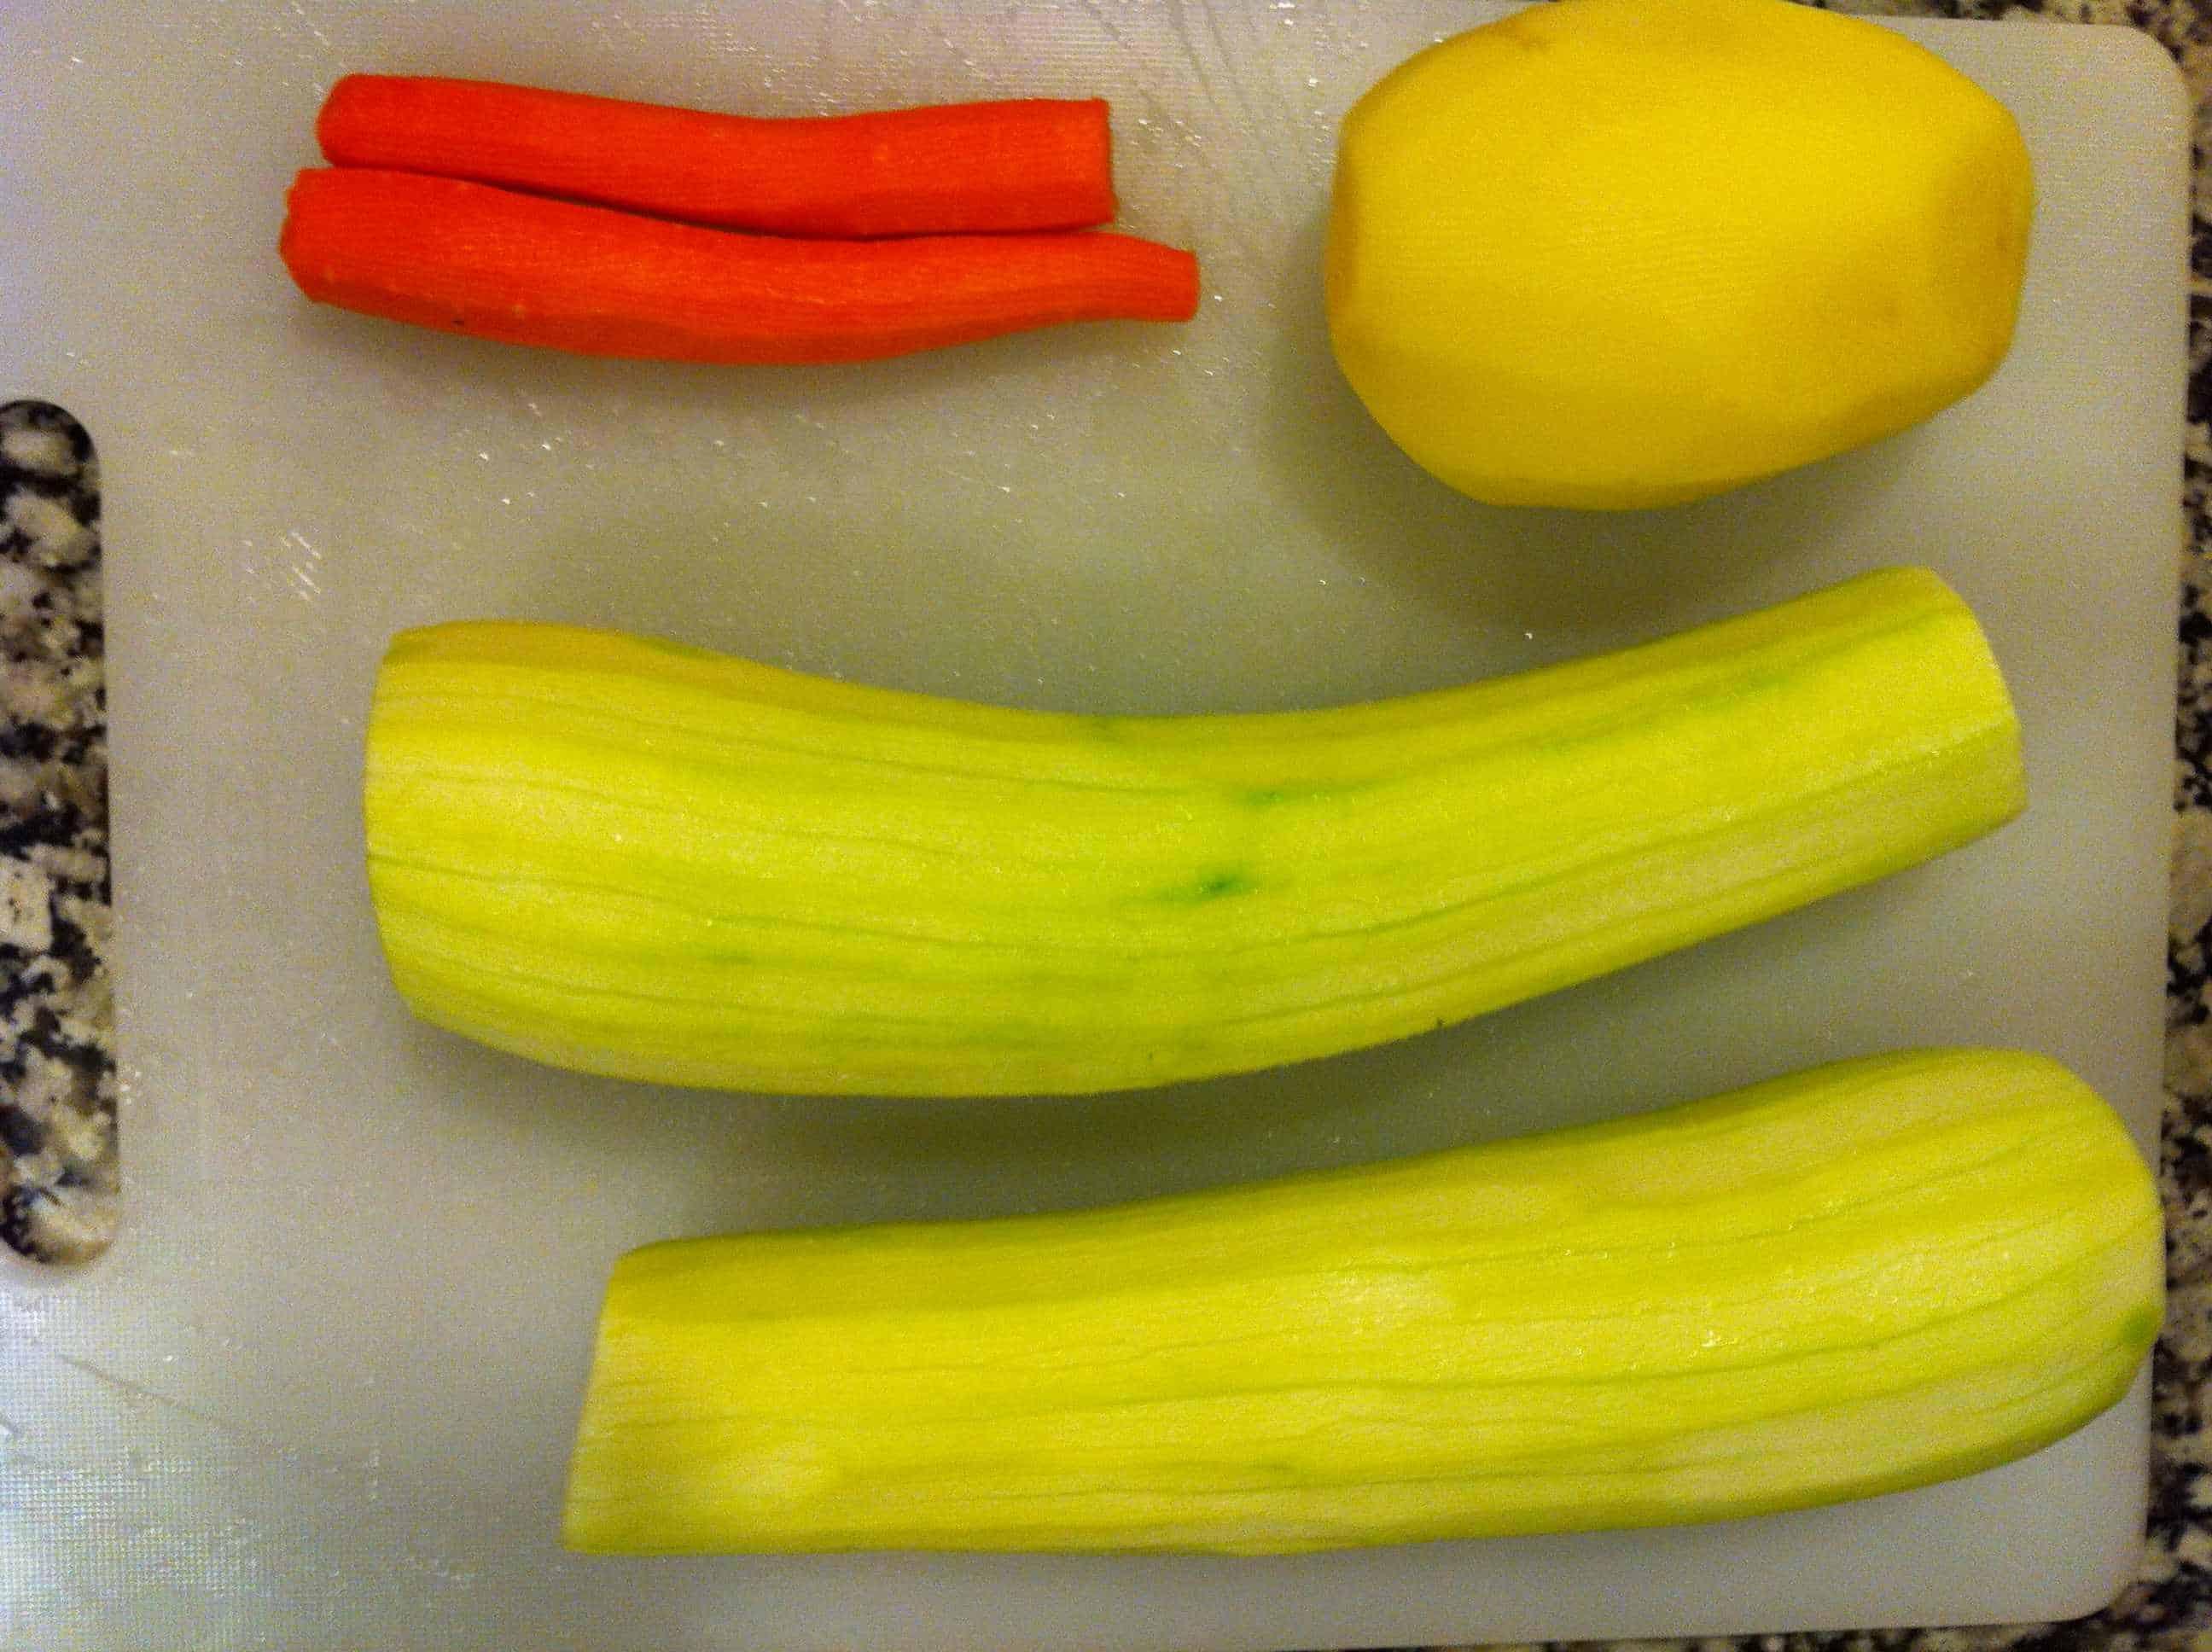 calabacc3adn-patata-zanahoria